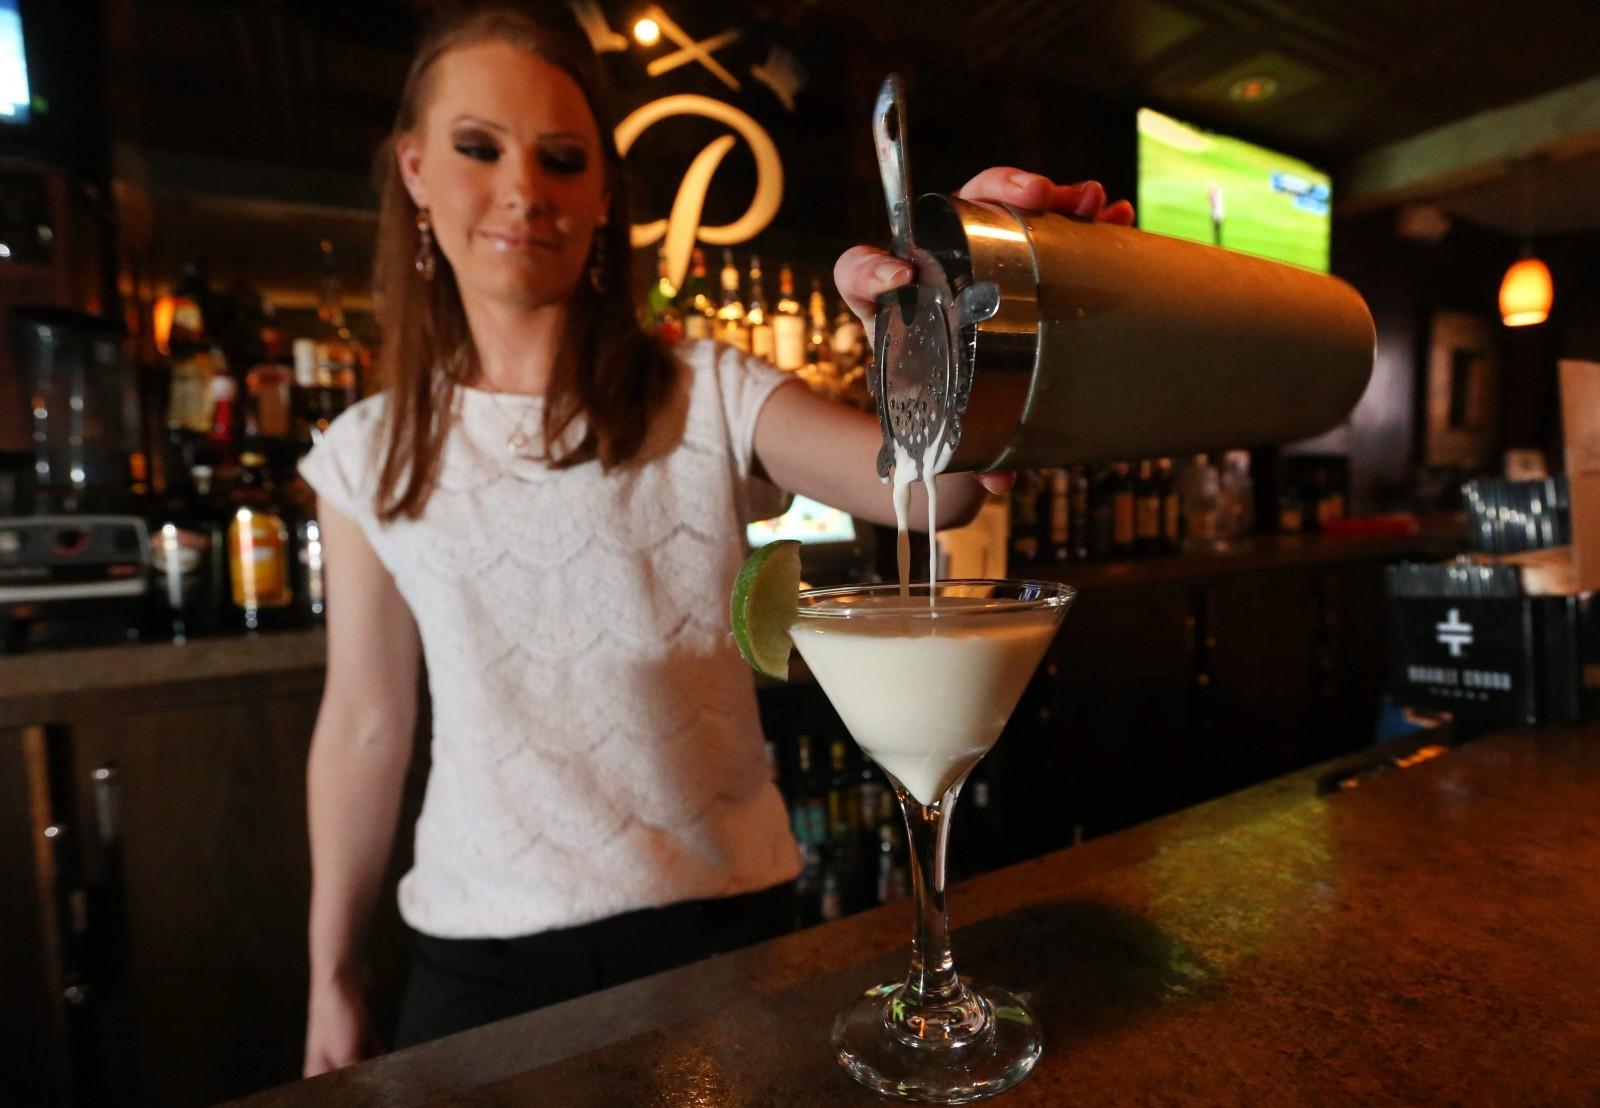 Bartender Jennifer Maulucci makes a key lime martini at Protocol Restaurant. (Sharon Cantillon/Buffalo News)